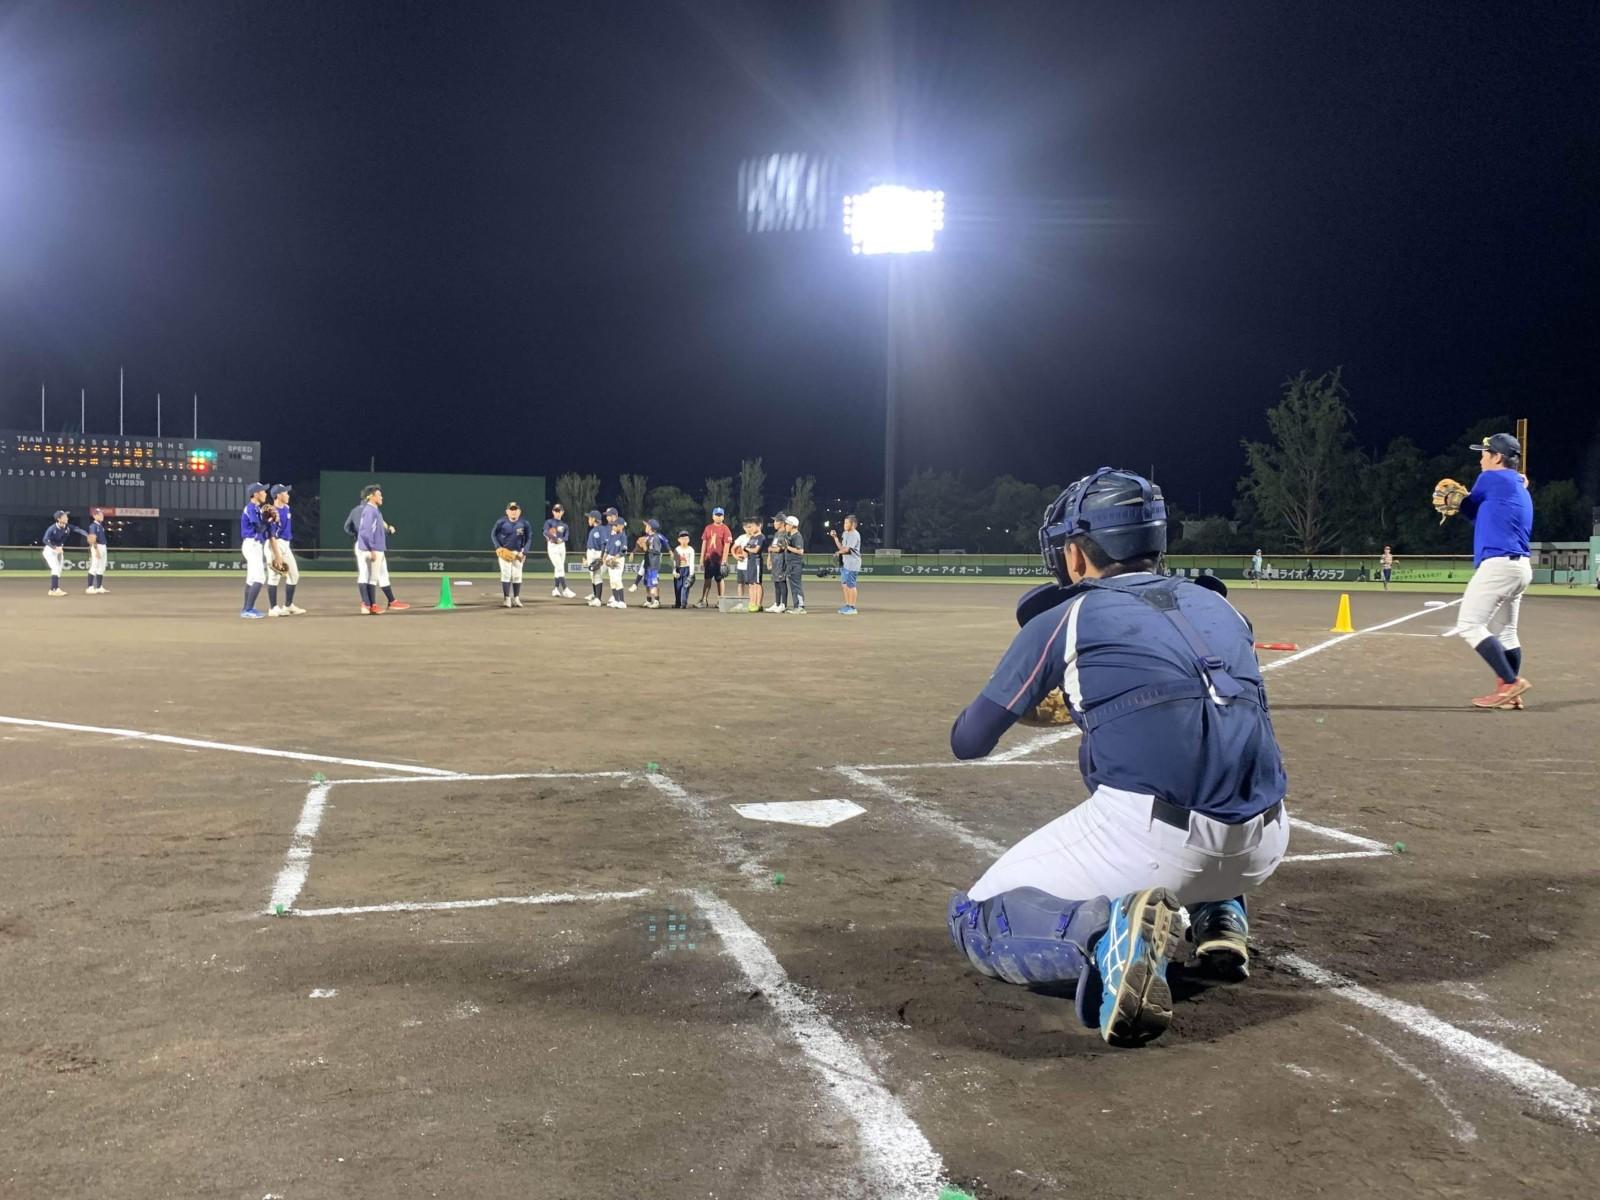 2019.10.10 J:comスタジアム土浦でキャッチボールをしよう! スピードガン計測